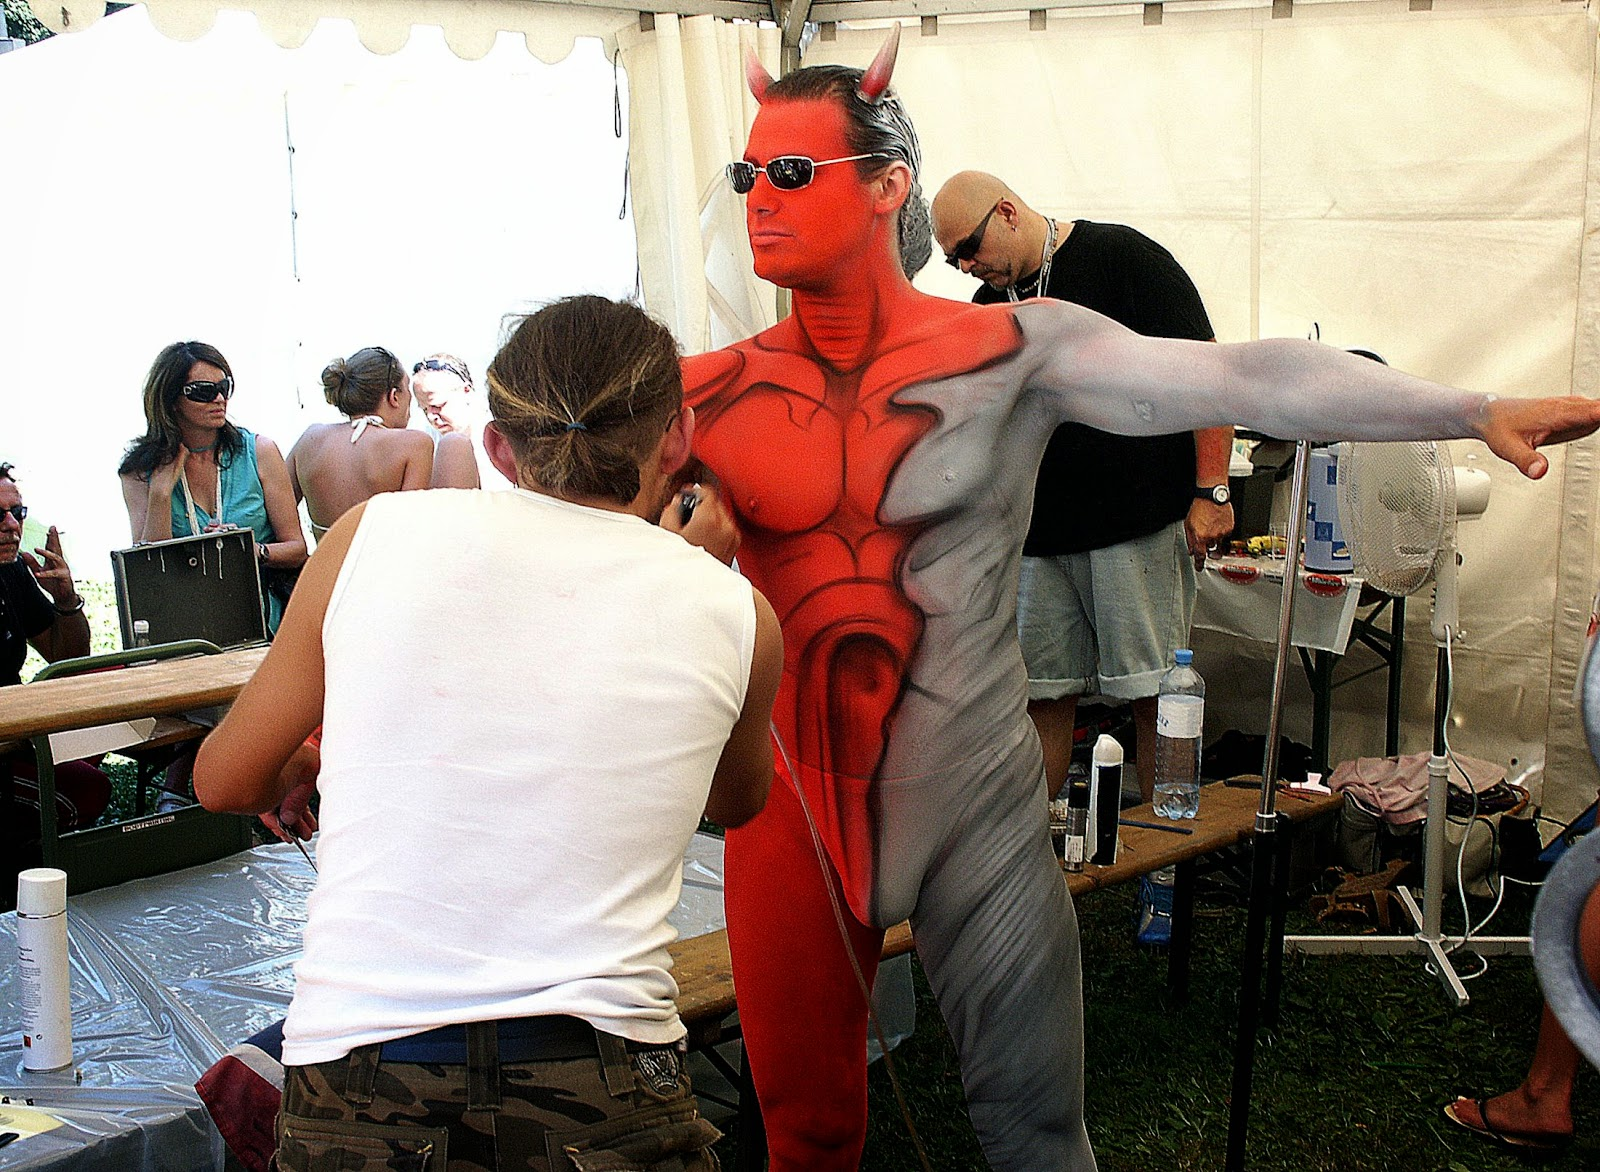 Muscular gay hentai